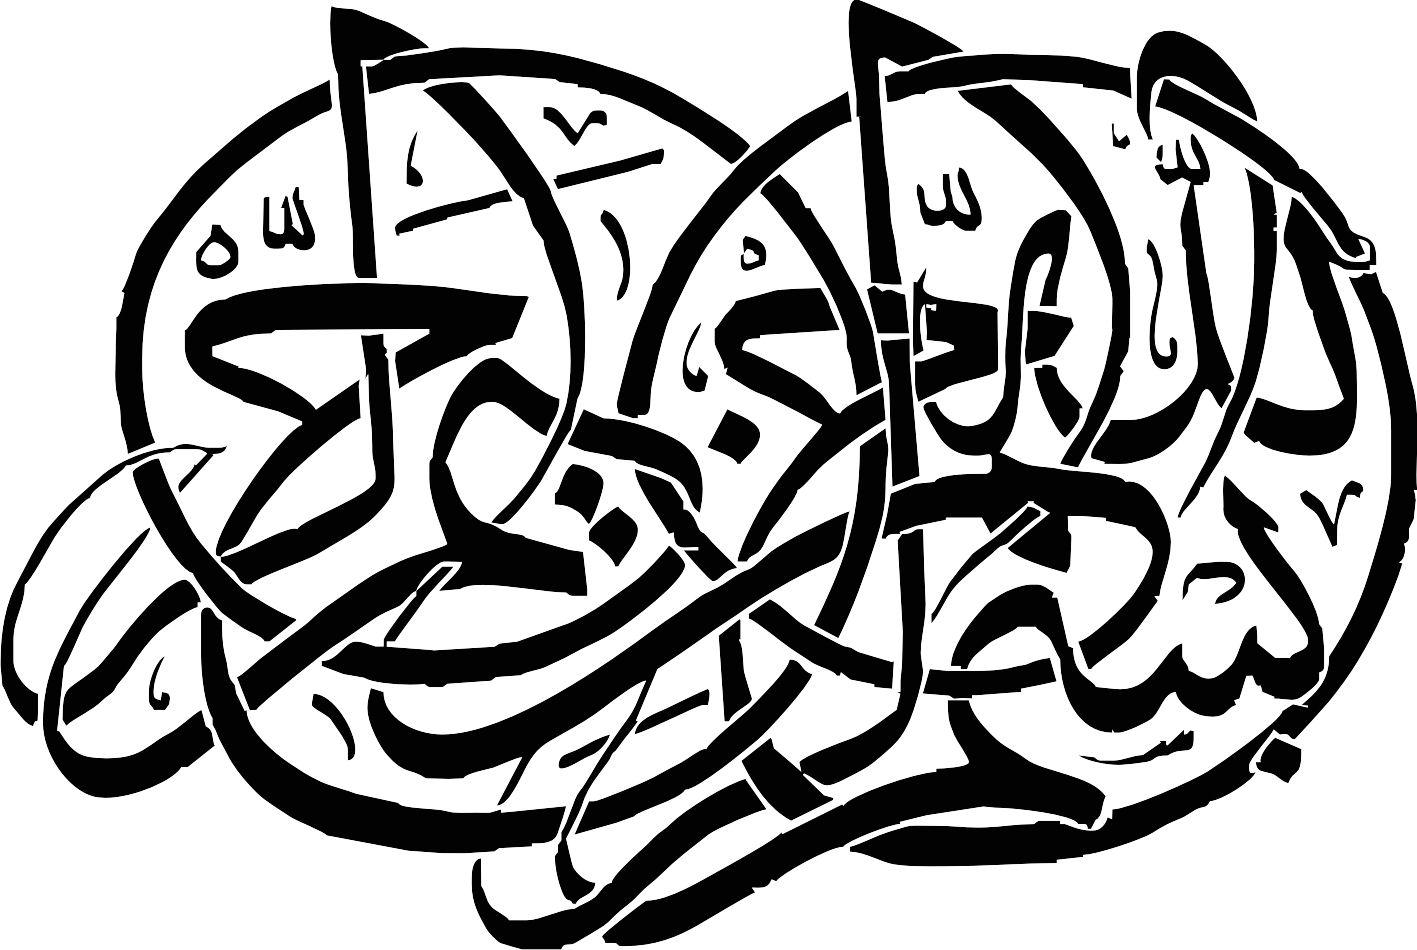 ۱۱۲ طرح بسم الله الرحمن الرحیم برای پایان نامه، ورد و پاورپوینت